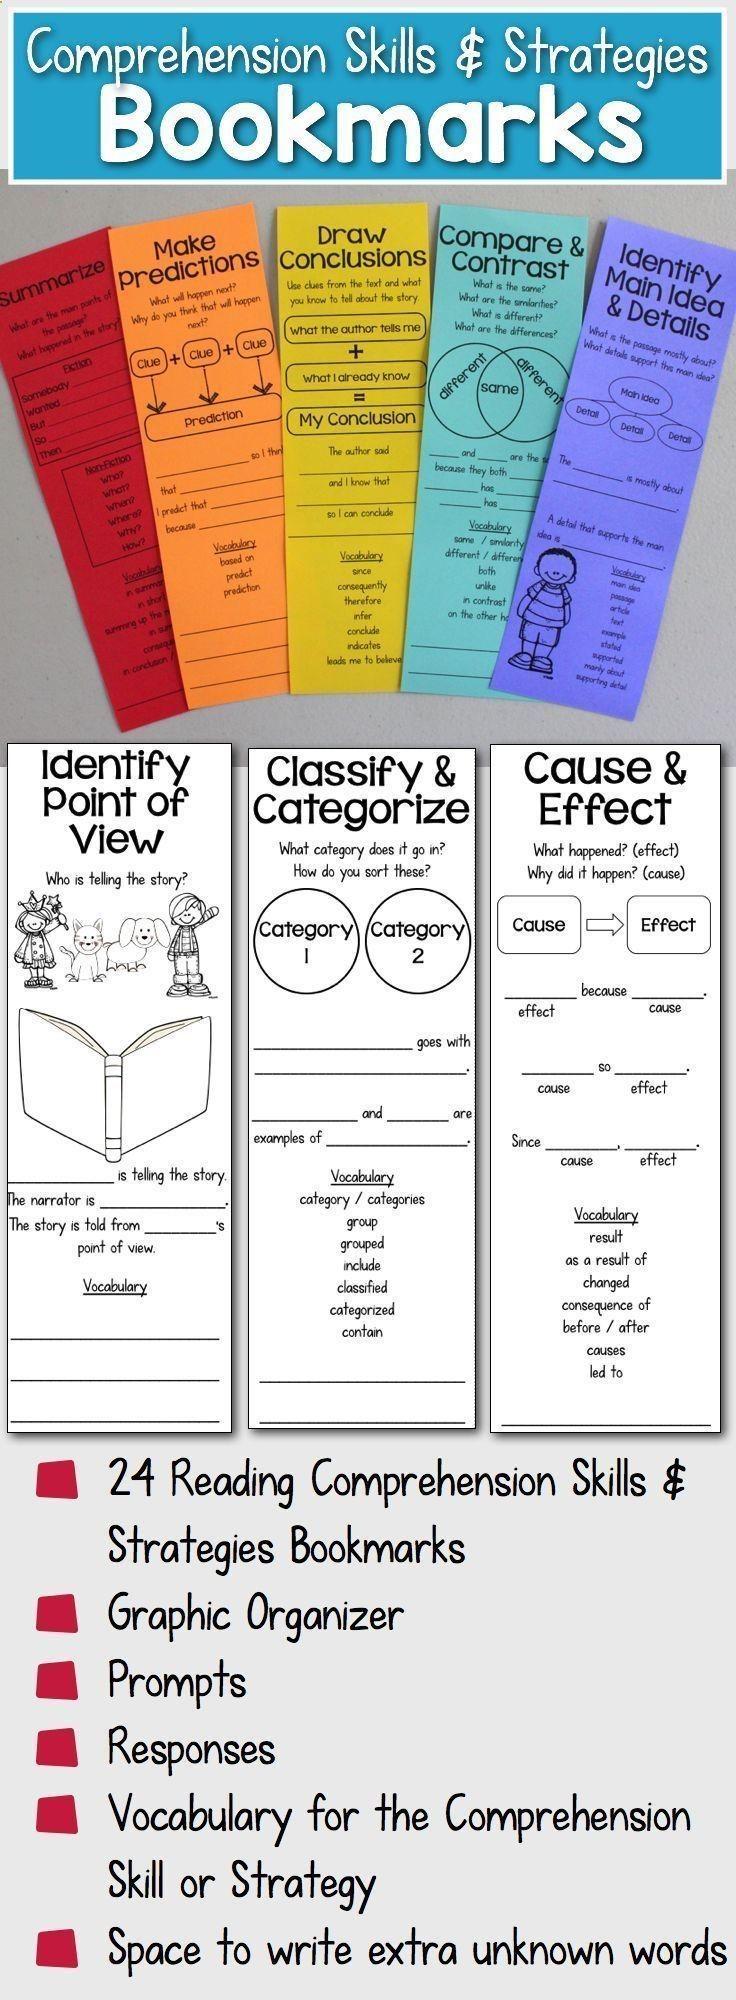 Teach Your Child To Read Comprehension Skills Reading Strategies Bookmarks Printab Teaching Comprehension Reading Comprehension Skills Comprehension Bookmarks How to teach reading comprehension ks2